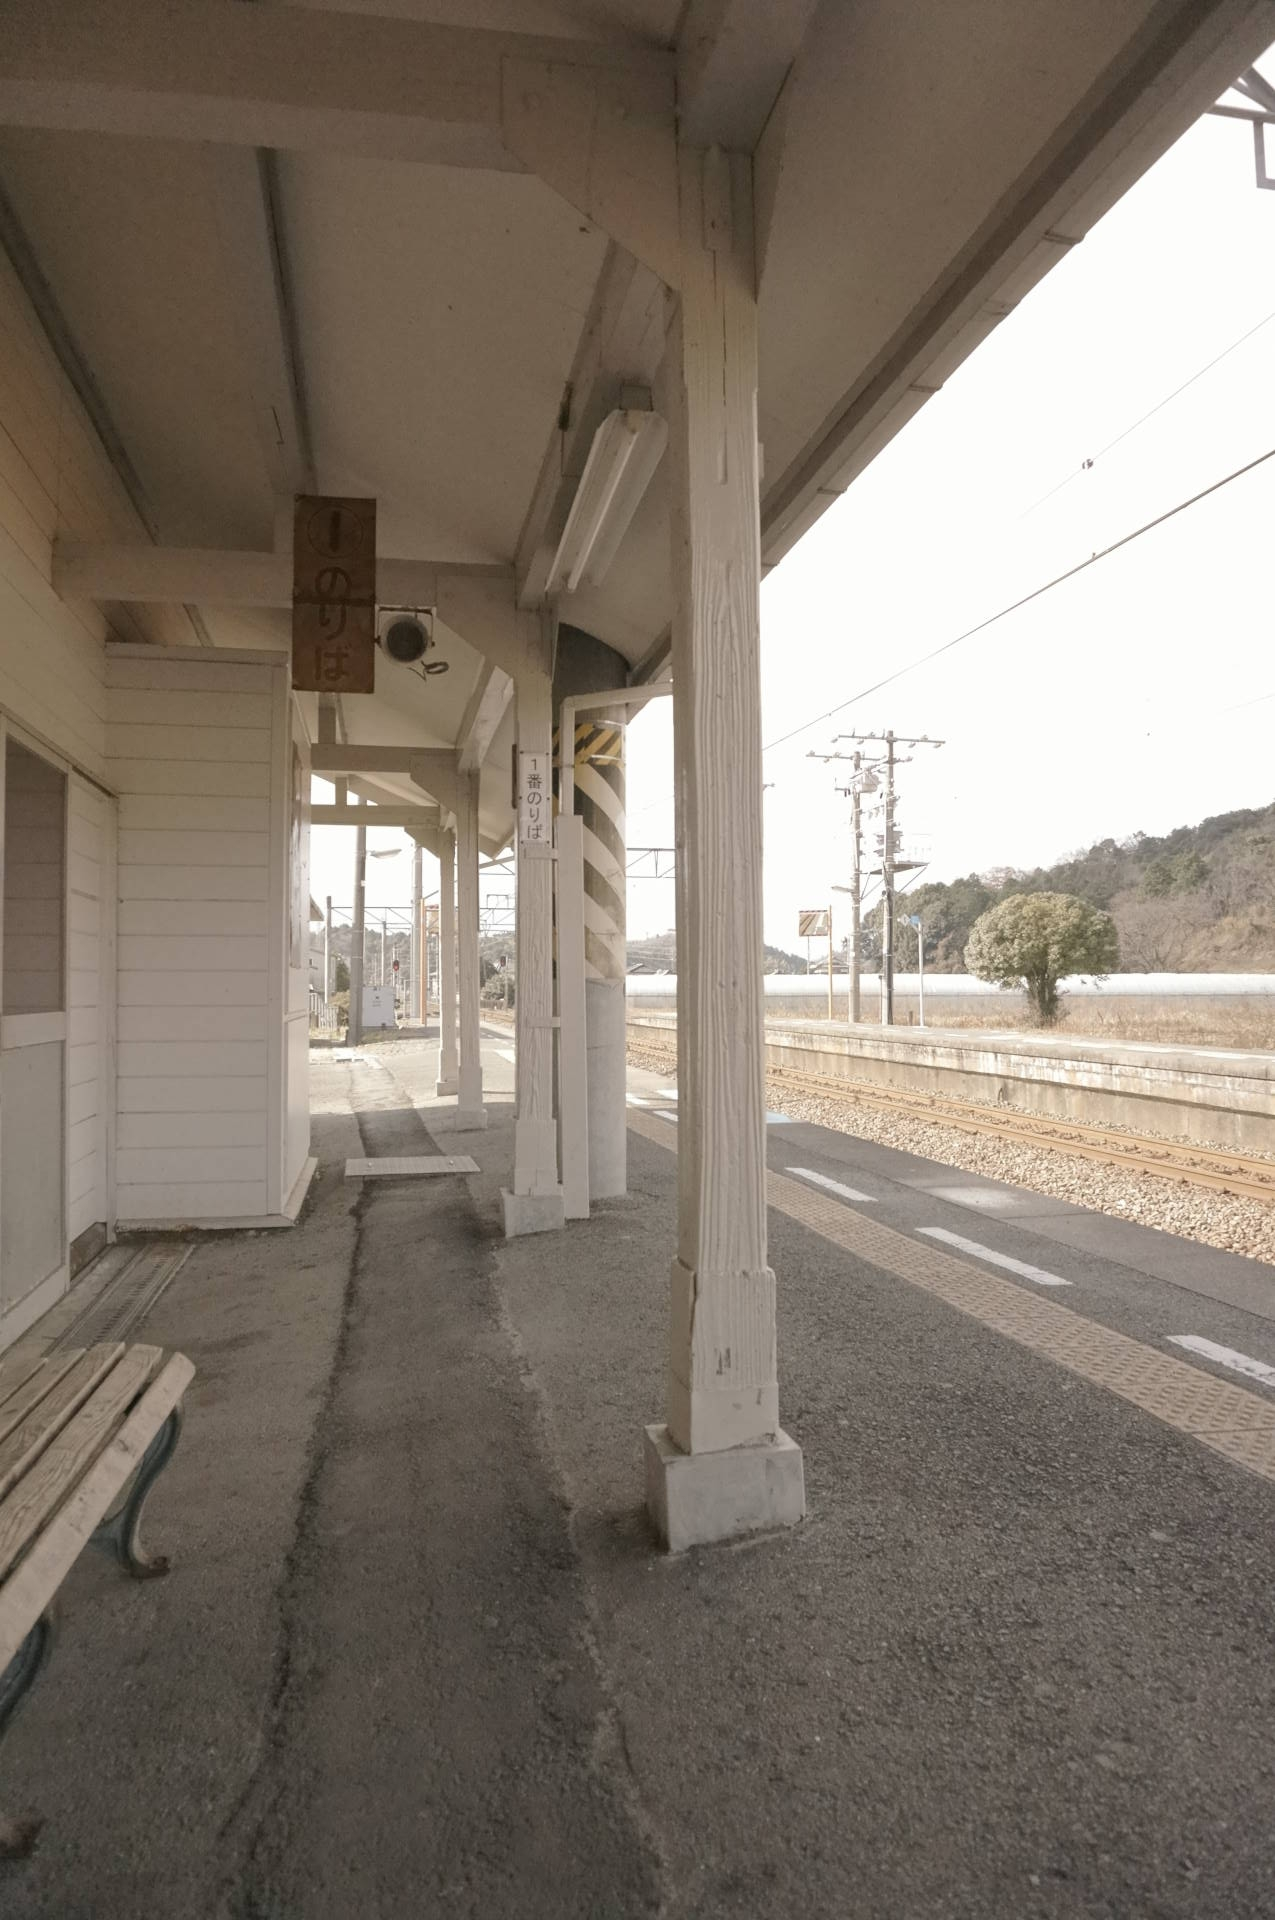 DSC04833_2.jpg